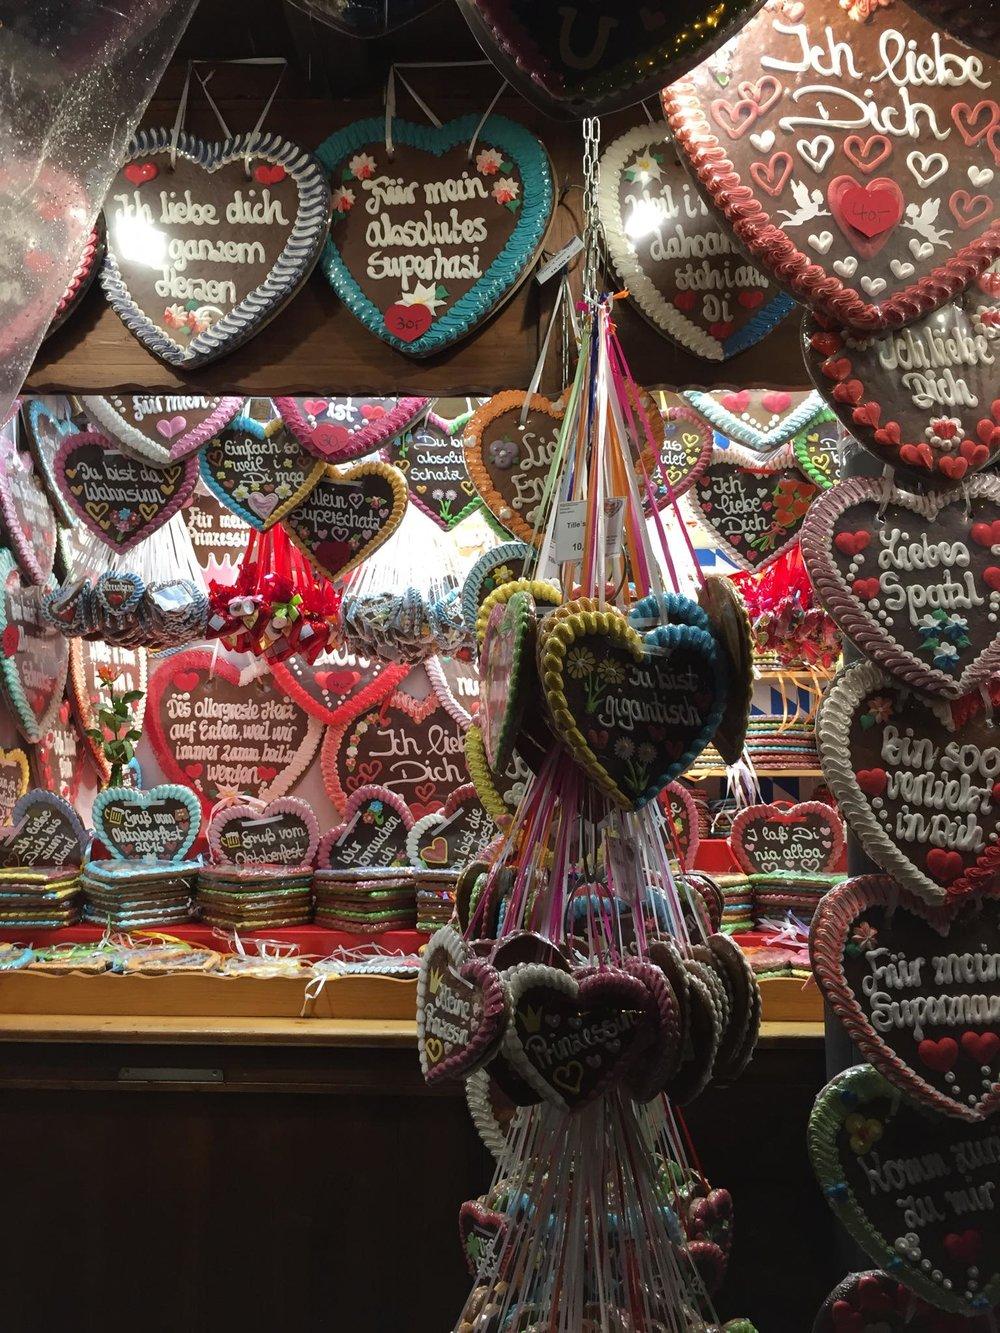 iNSIDEEurope_Oktoberfest16_hearts.jpg